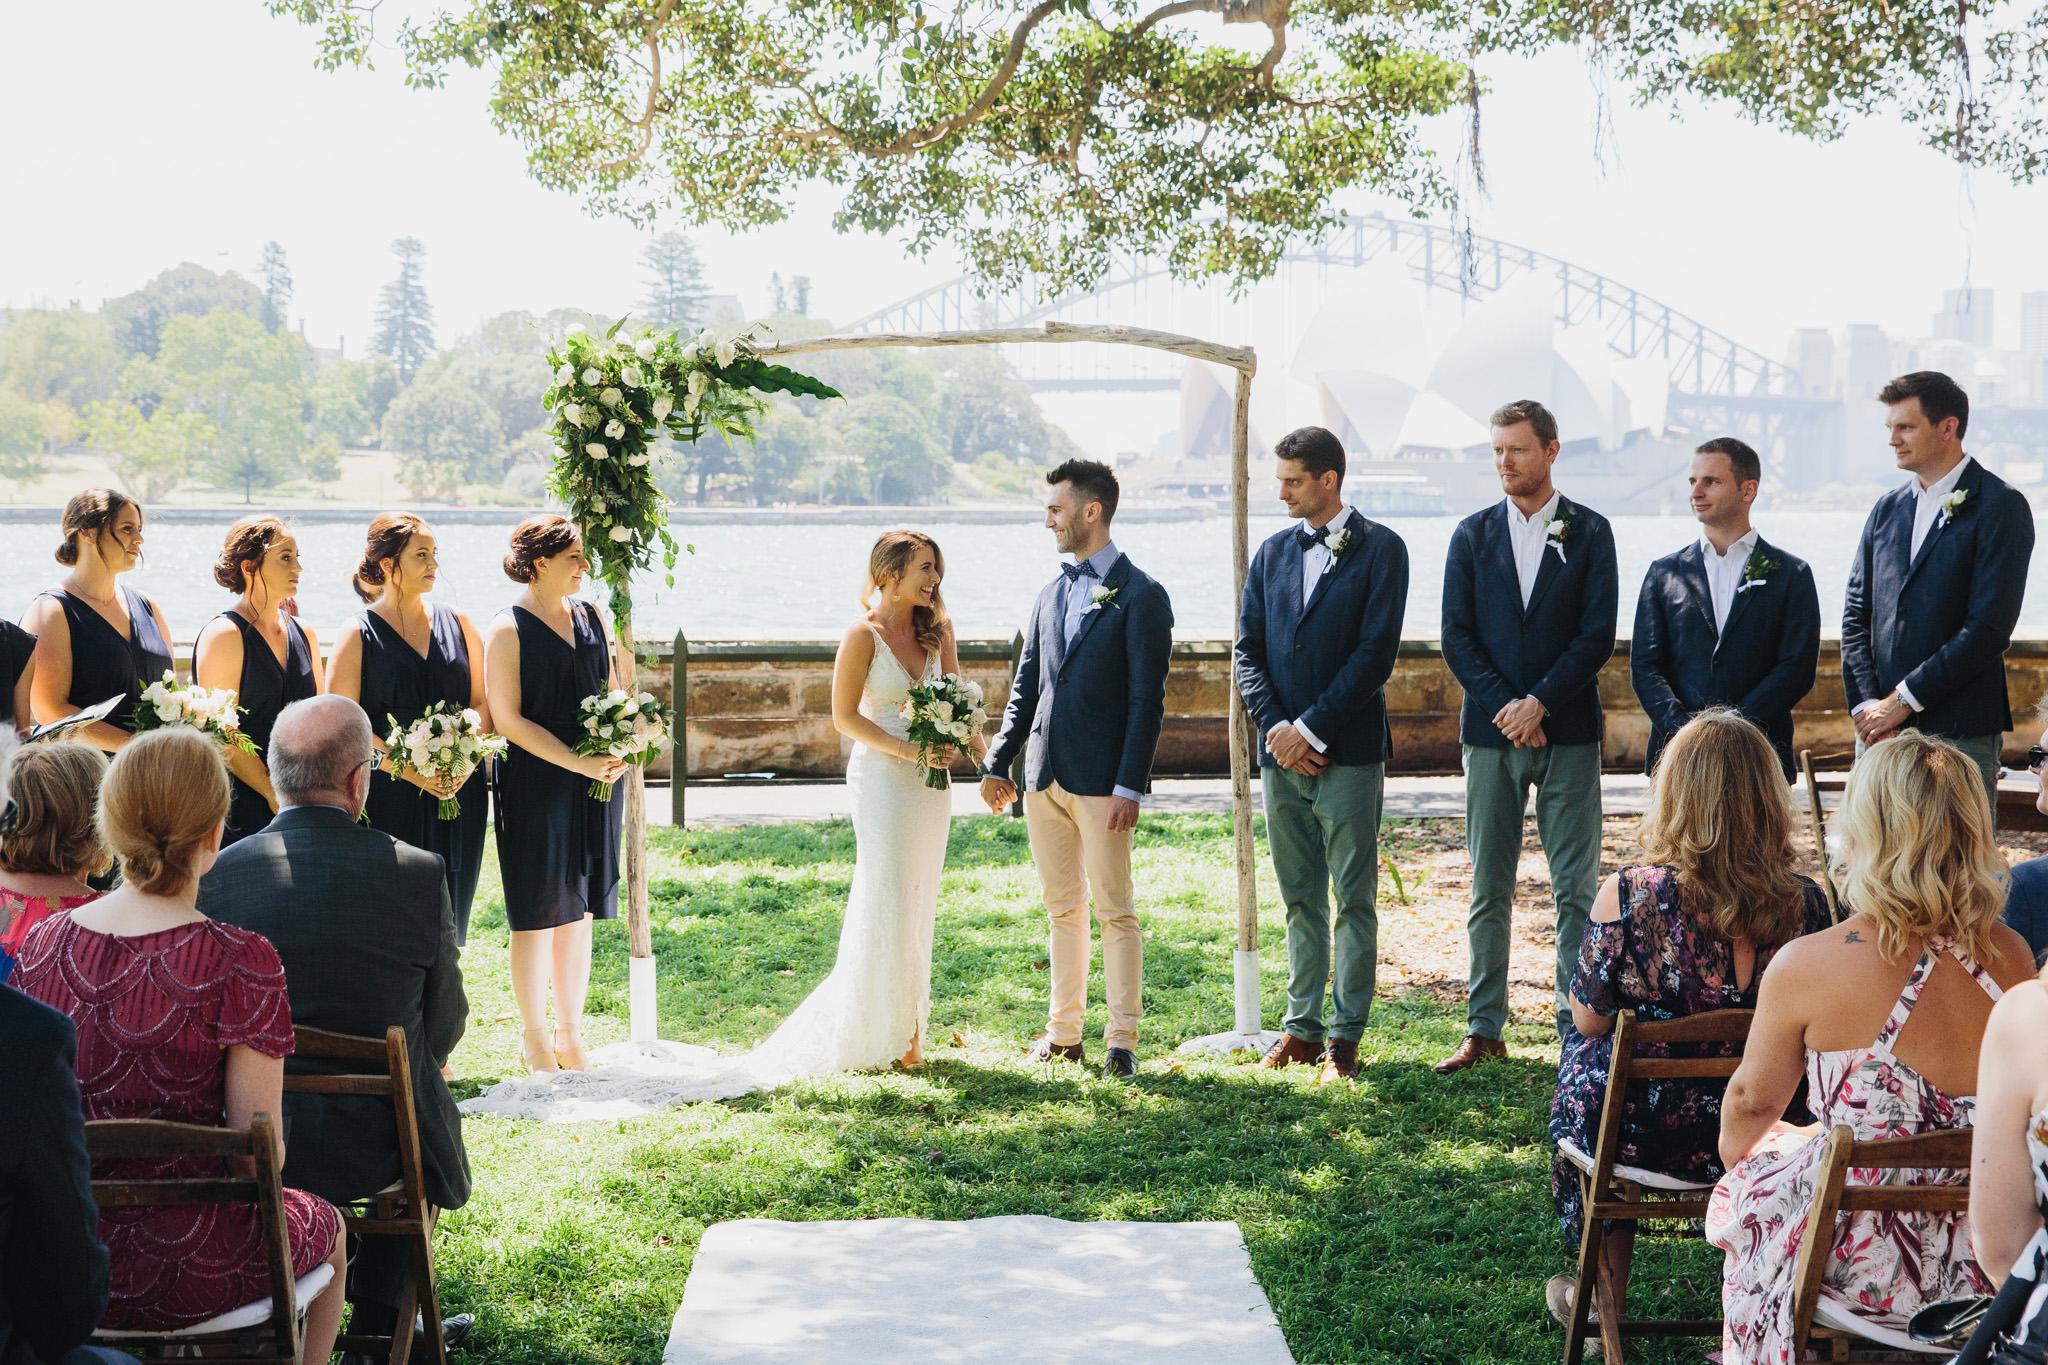 Wedding Ceremony Sydney Botanic Gardens Harbour View Lawn